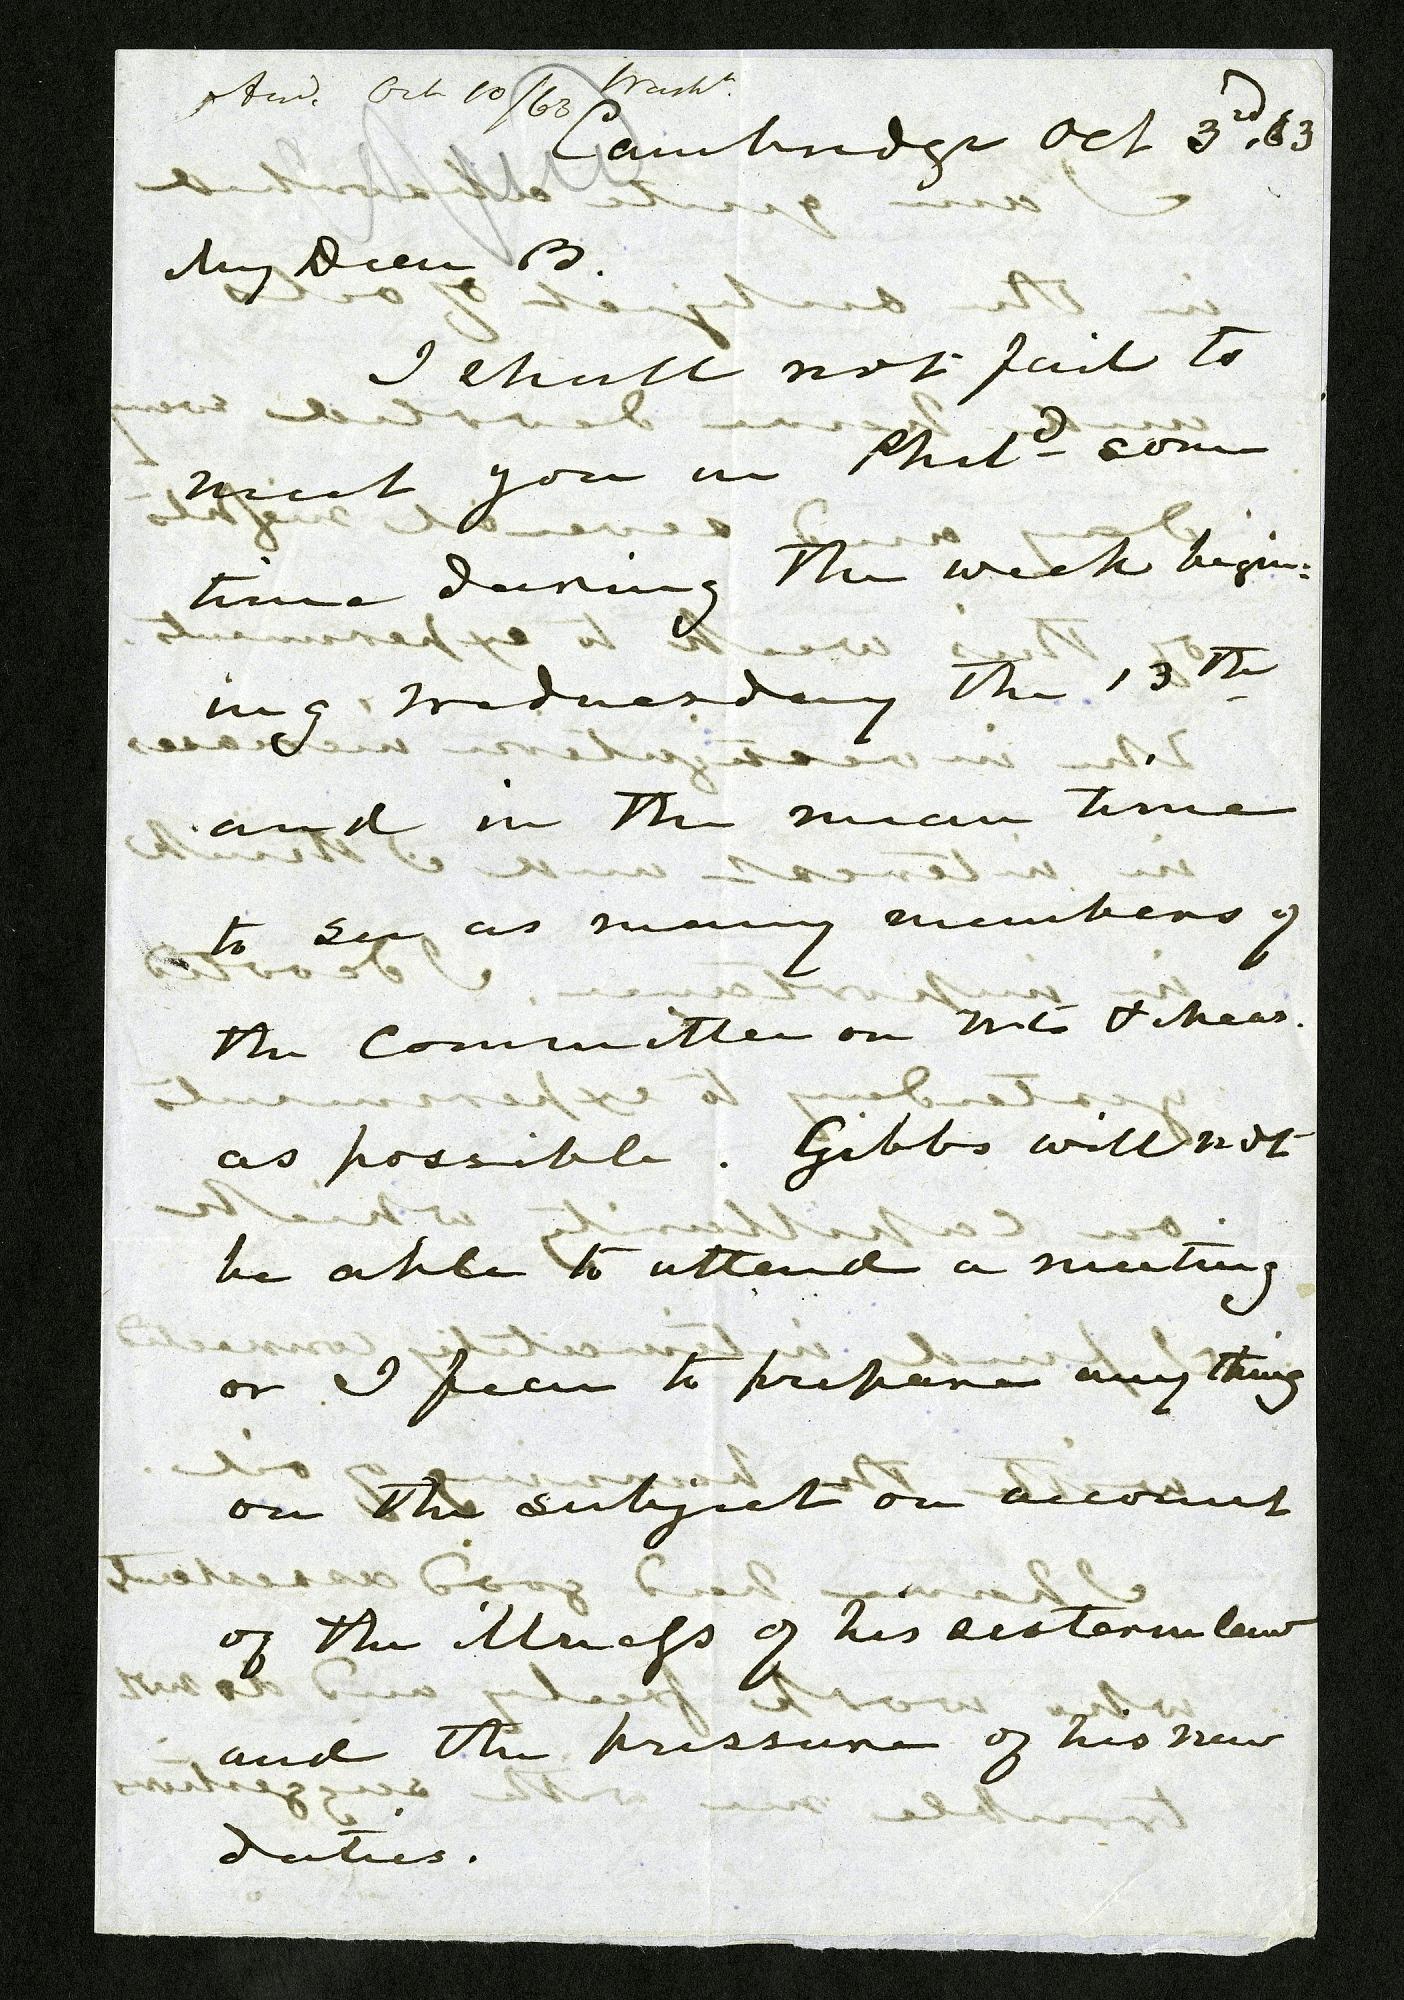 Joseph Henry's Letter to Alexander Dallas Bache (October 3, 1863)